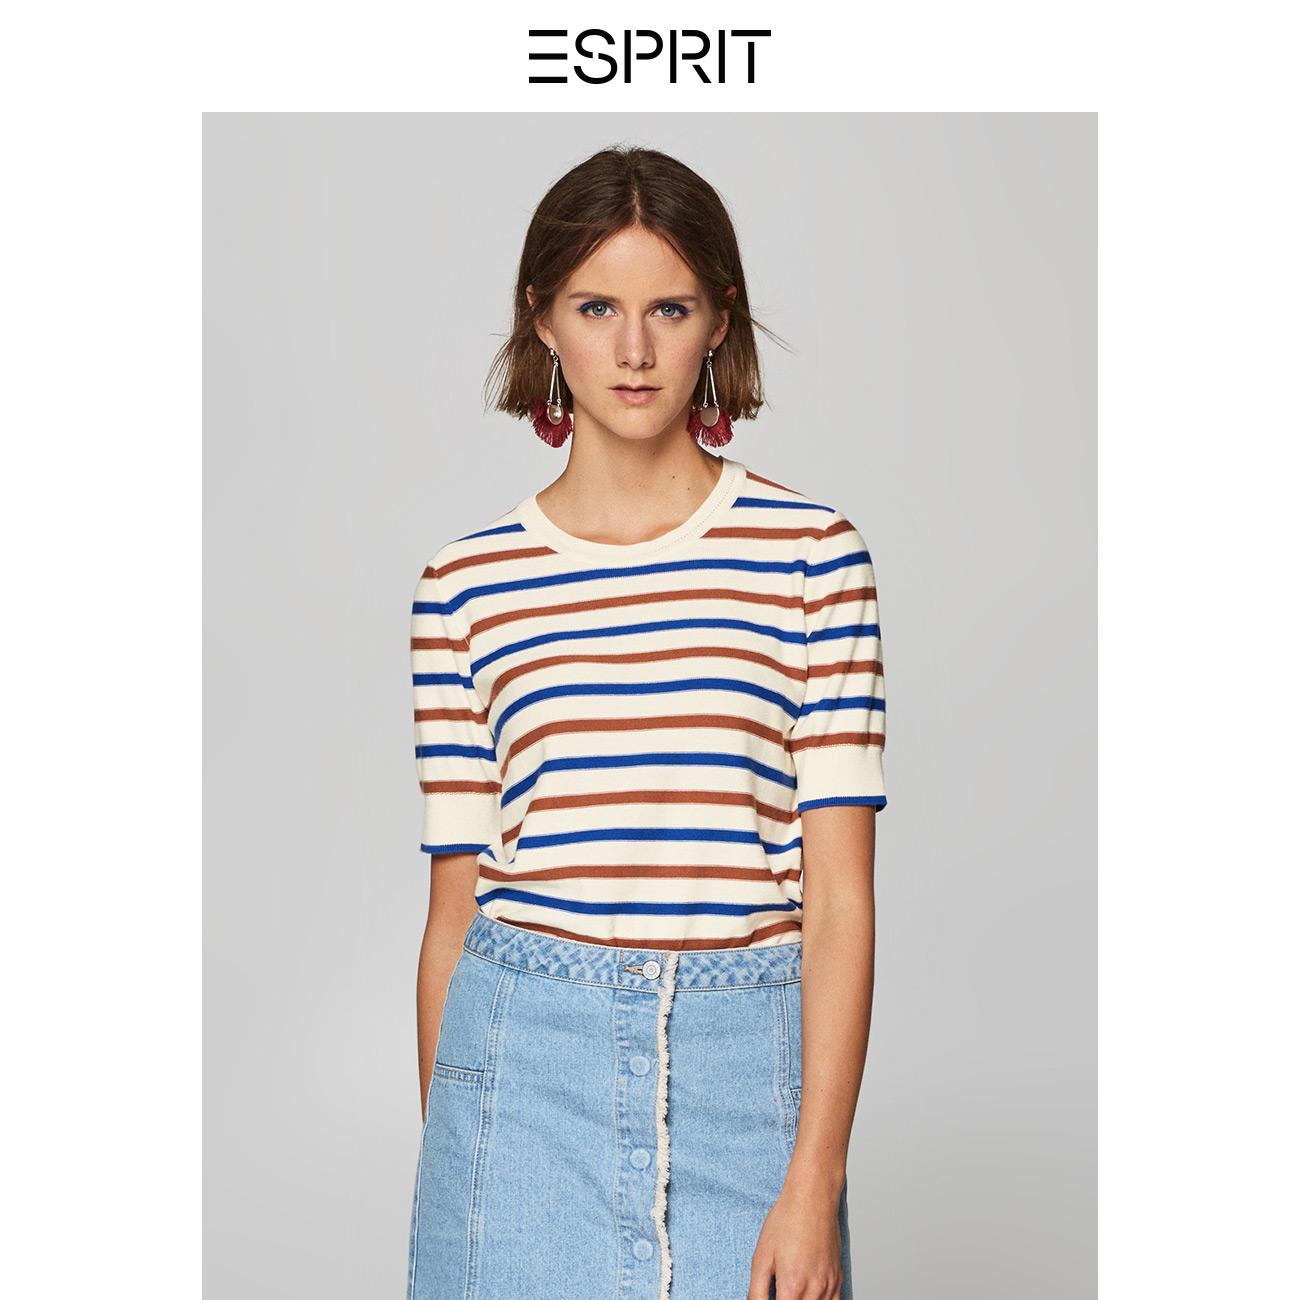 ESPRIT针织衫